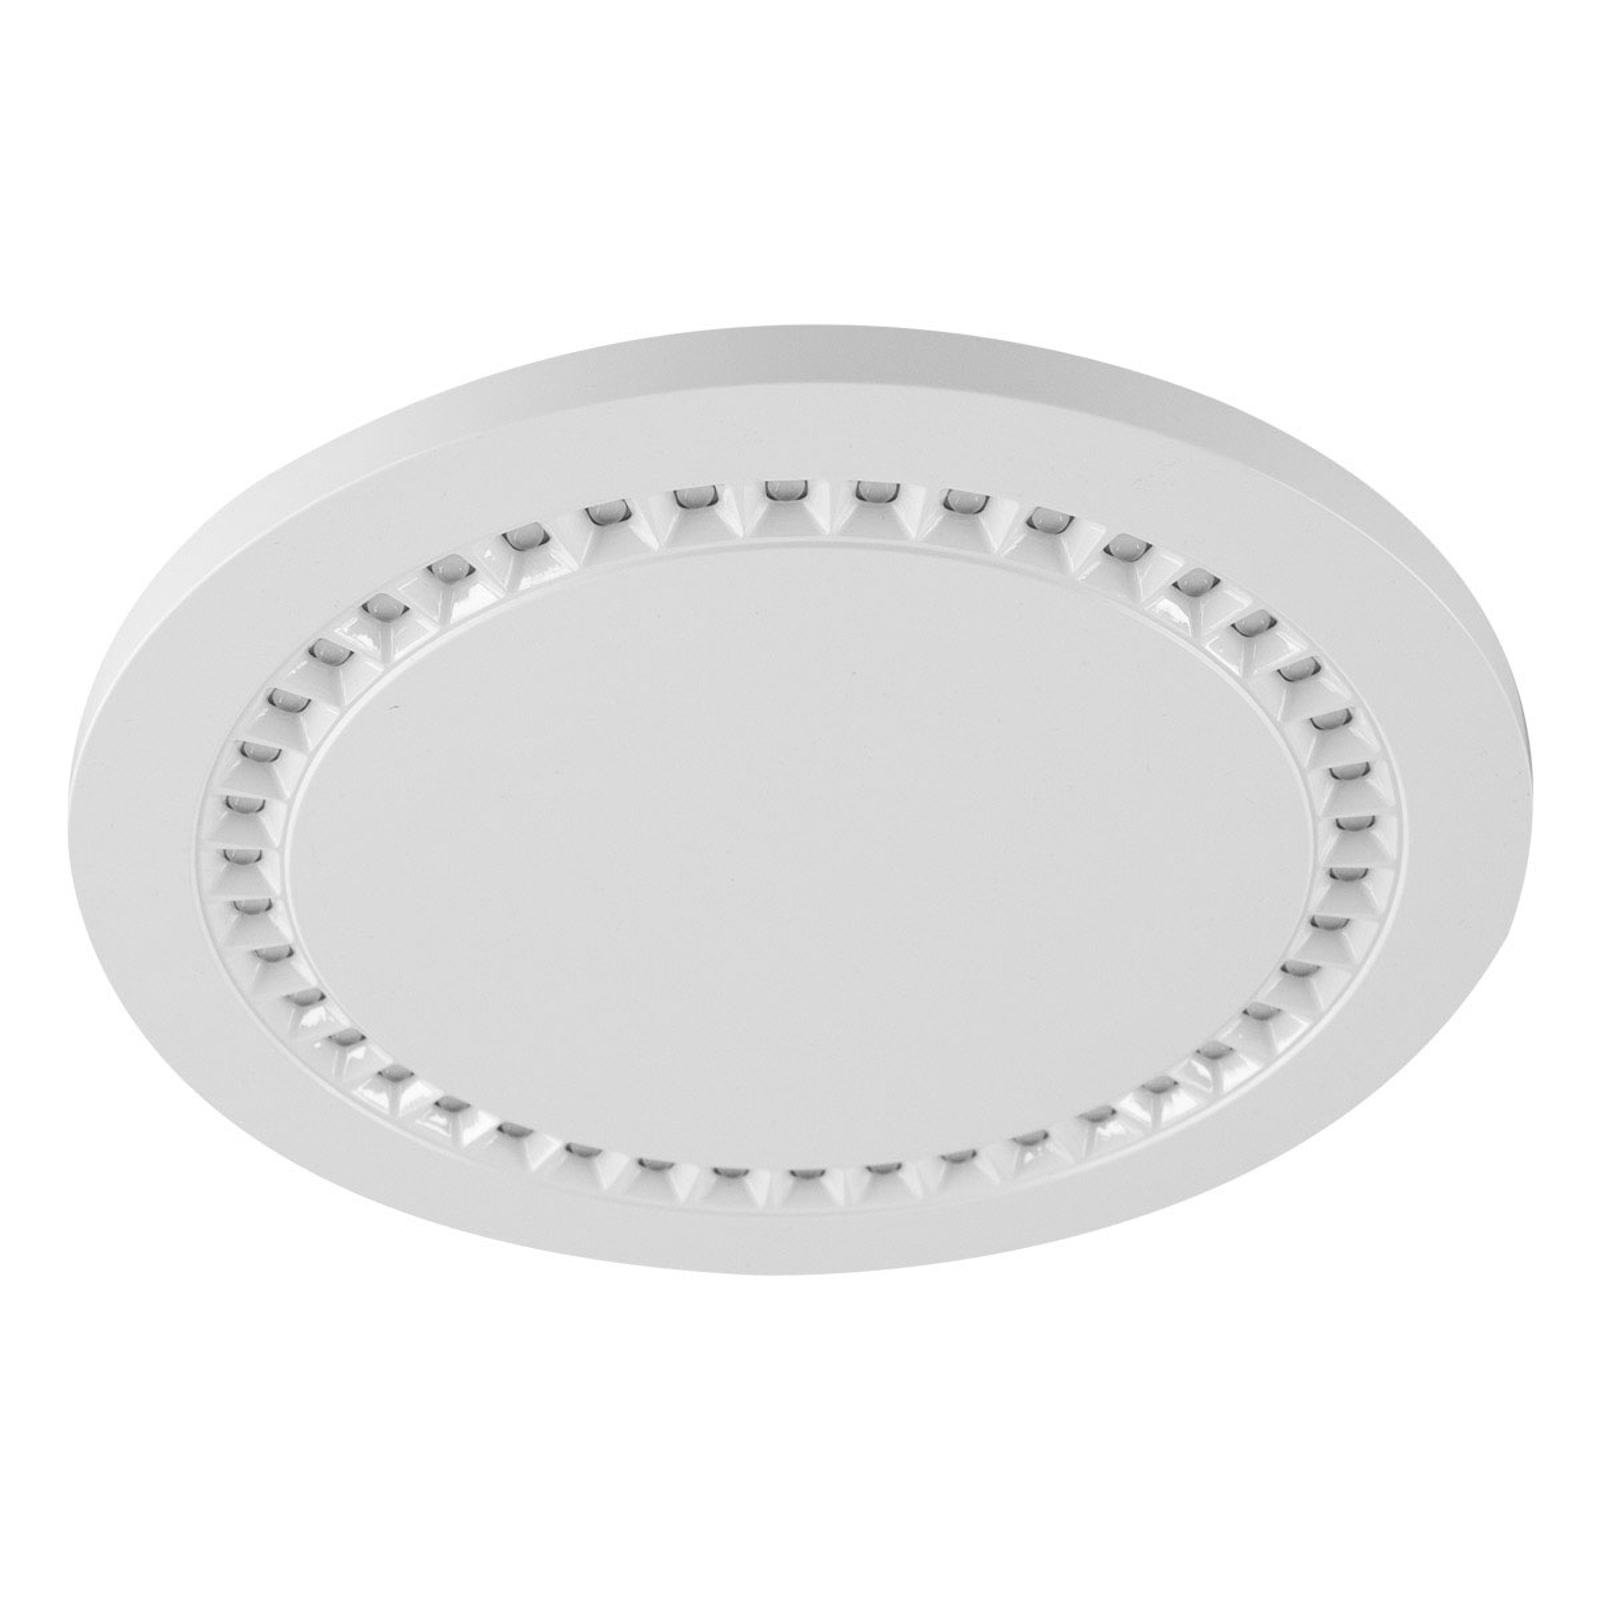 EVN ALR LED-Panel weiß 15W Ø30cm 3.000K